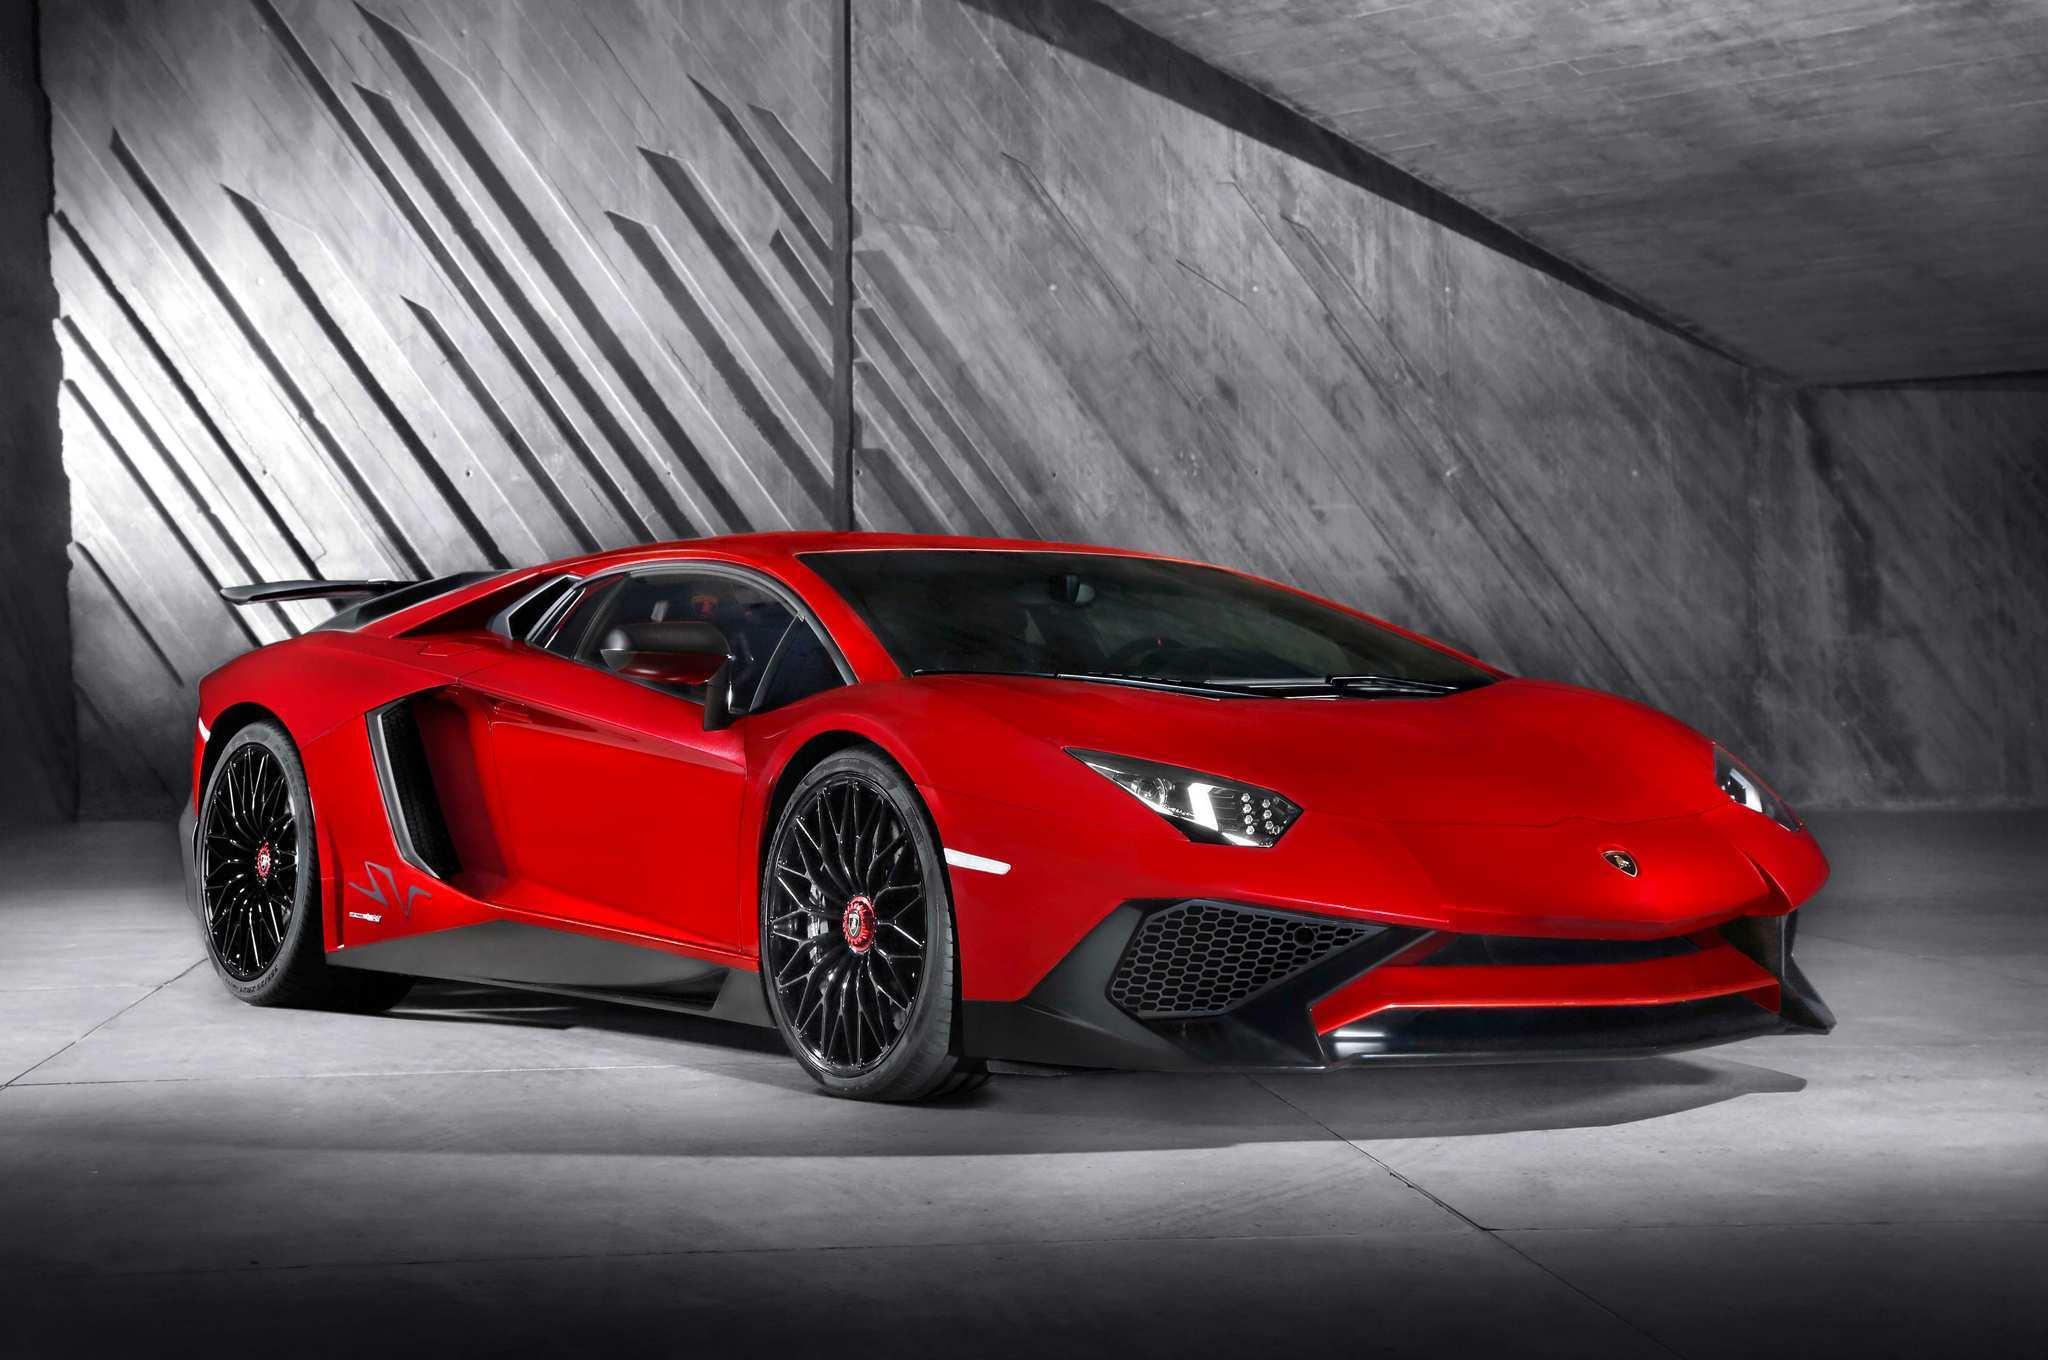 44 Gallery of 2020 Lamborghini Aventador Price Spy Shoot for 2020 Lamborghini Aventador Price